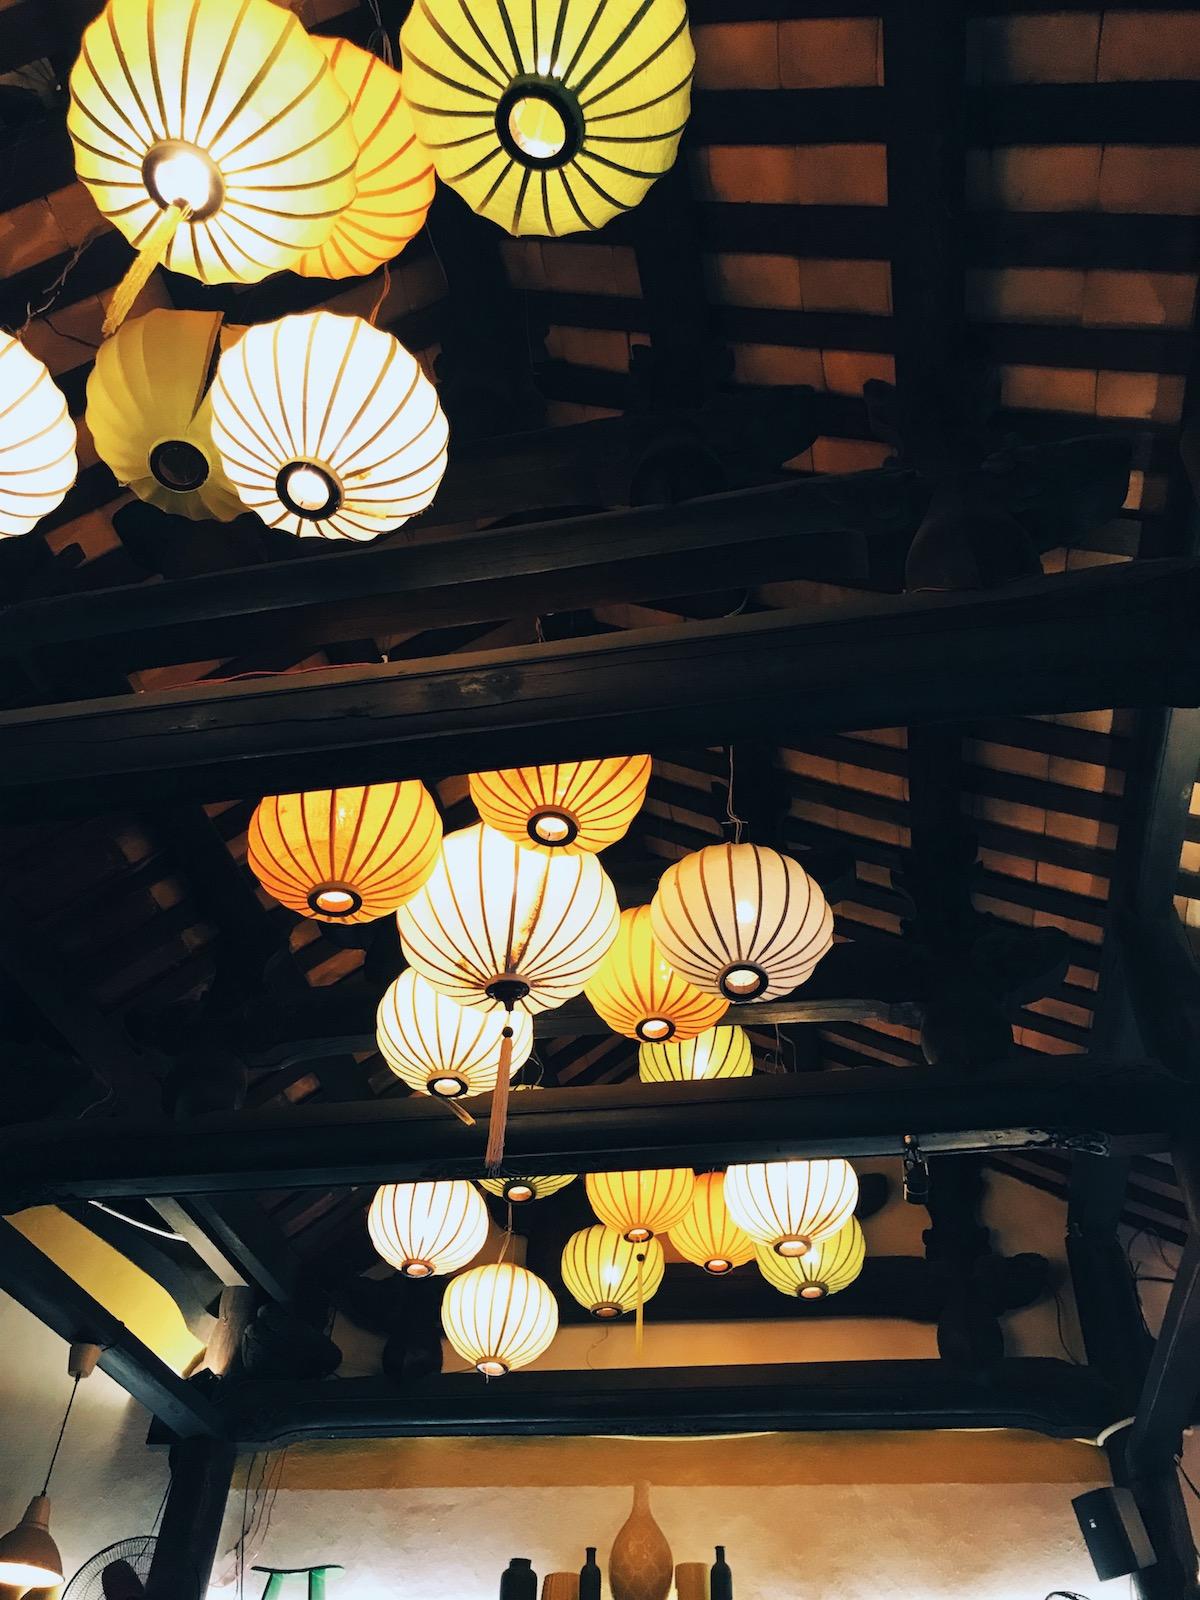 Morning Glory Restaurant, Best of Food + Coffee in Da Nang + Hoi An, Vietnam | Ruby Josephine